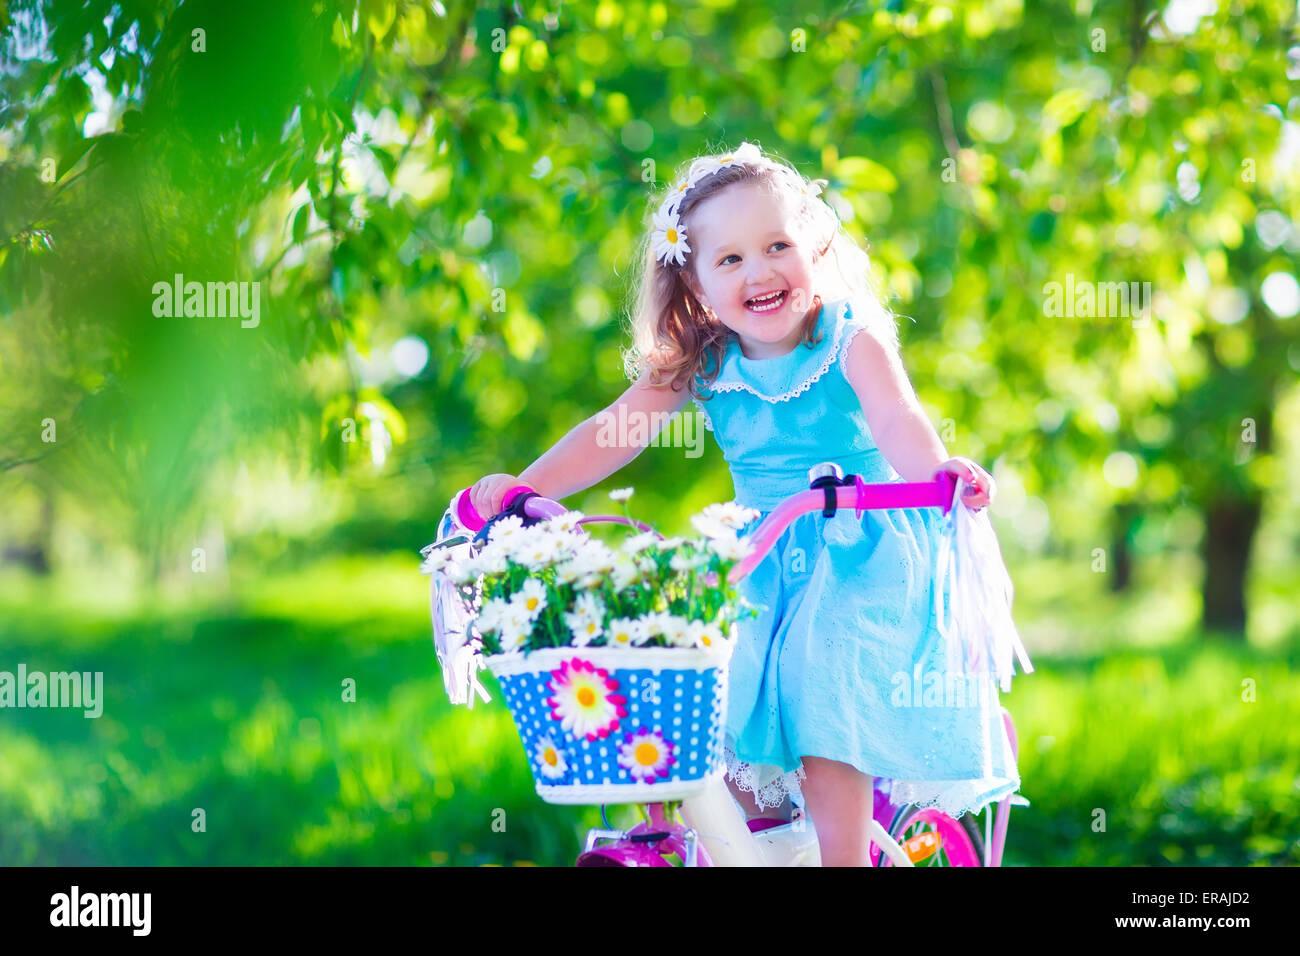 happy child riding a bike. cute kid biking outdoors. little girl in